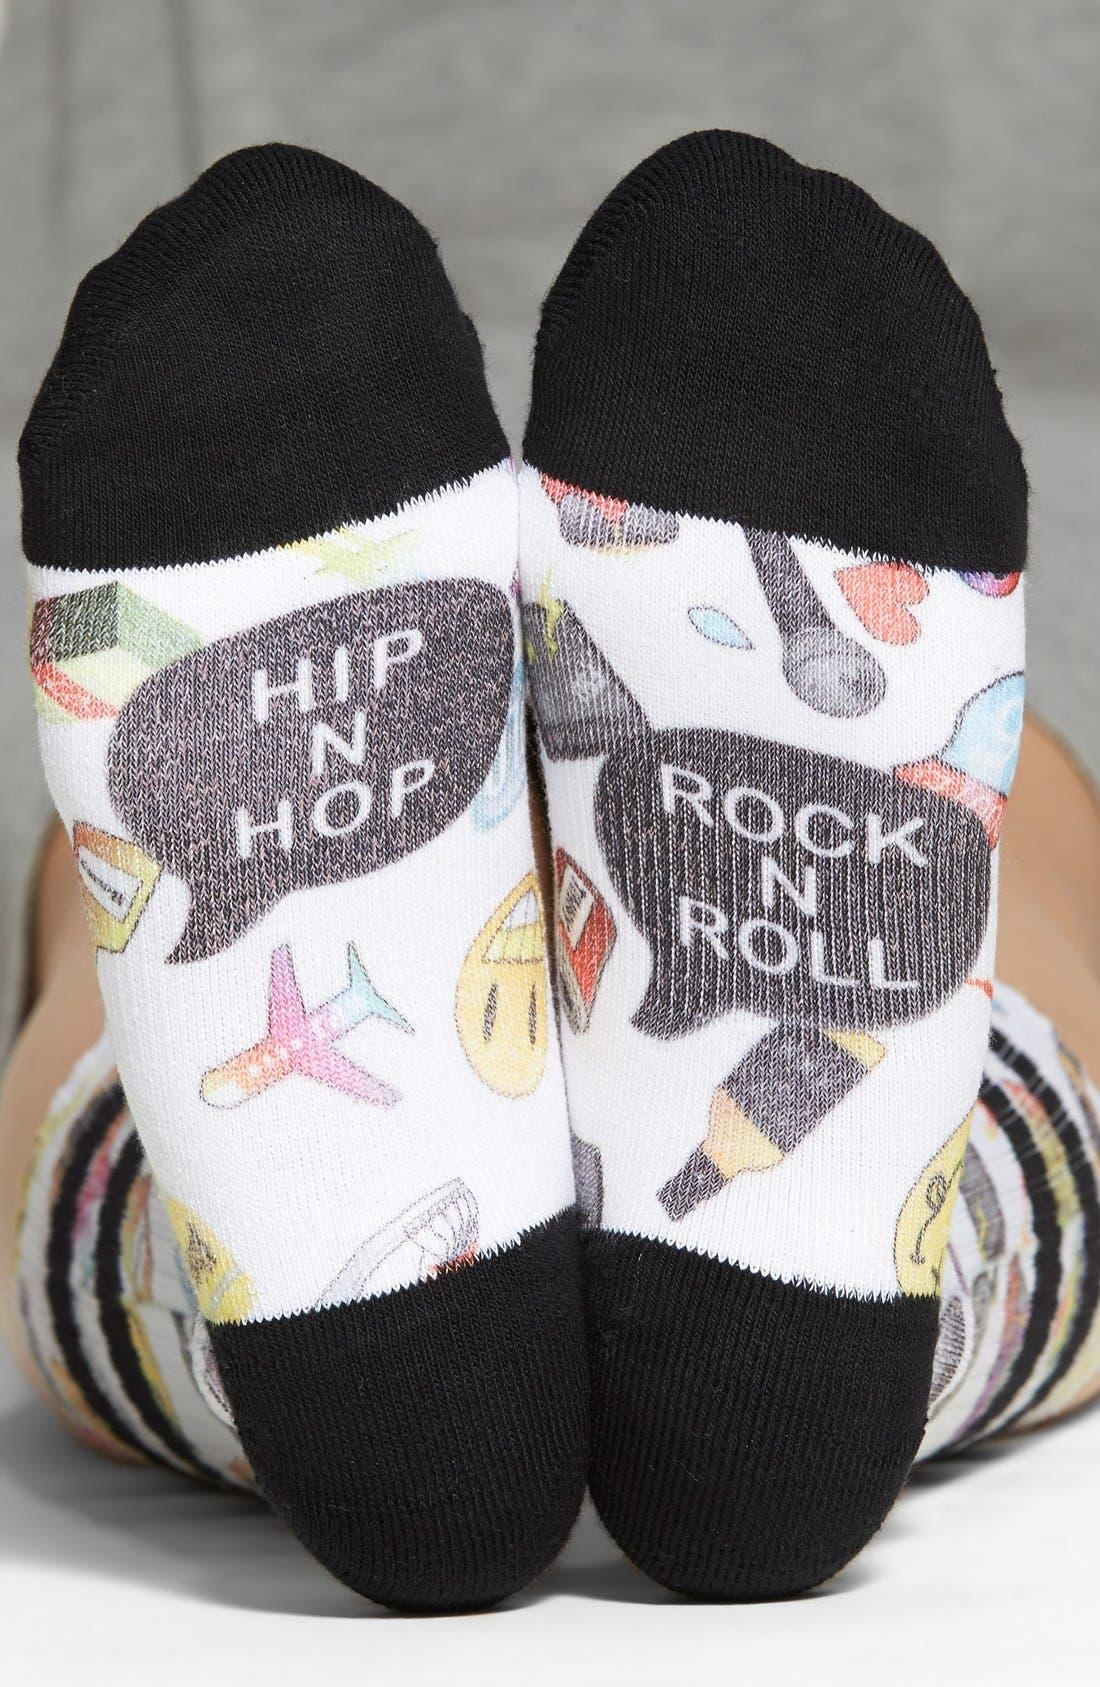 Main Image - Stance 'Hip 'N Hop' Crew Socks